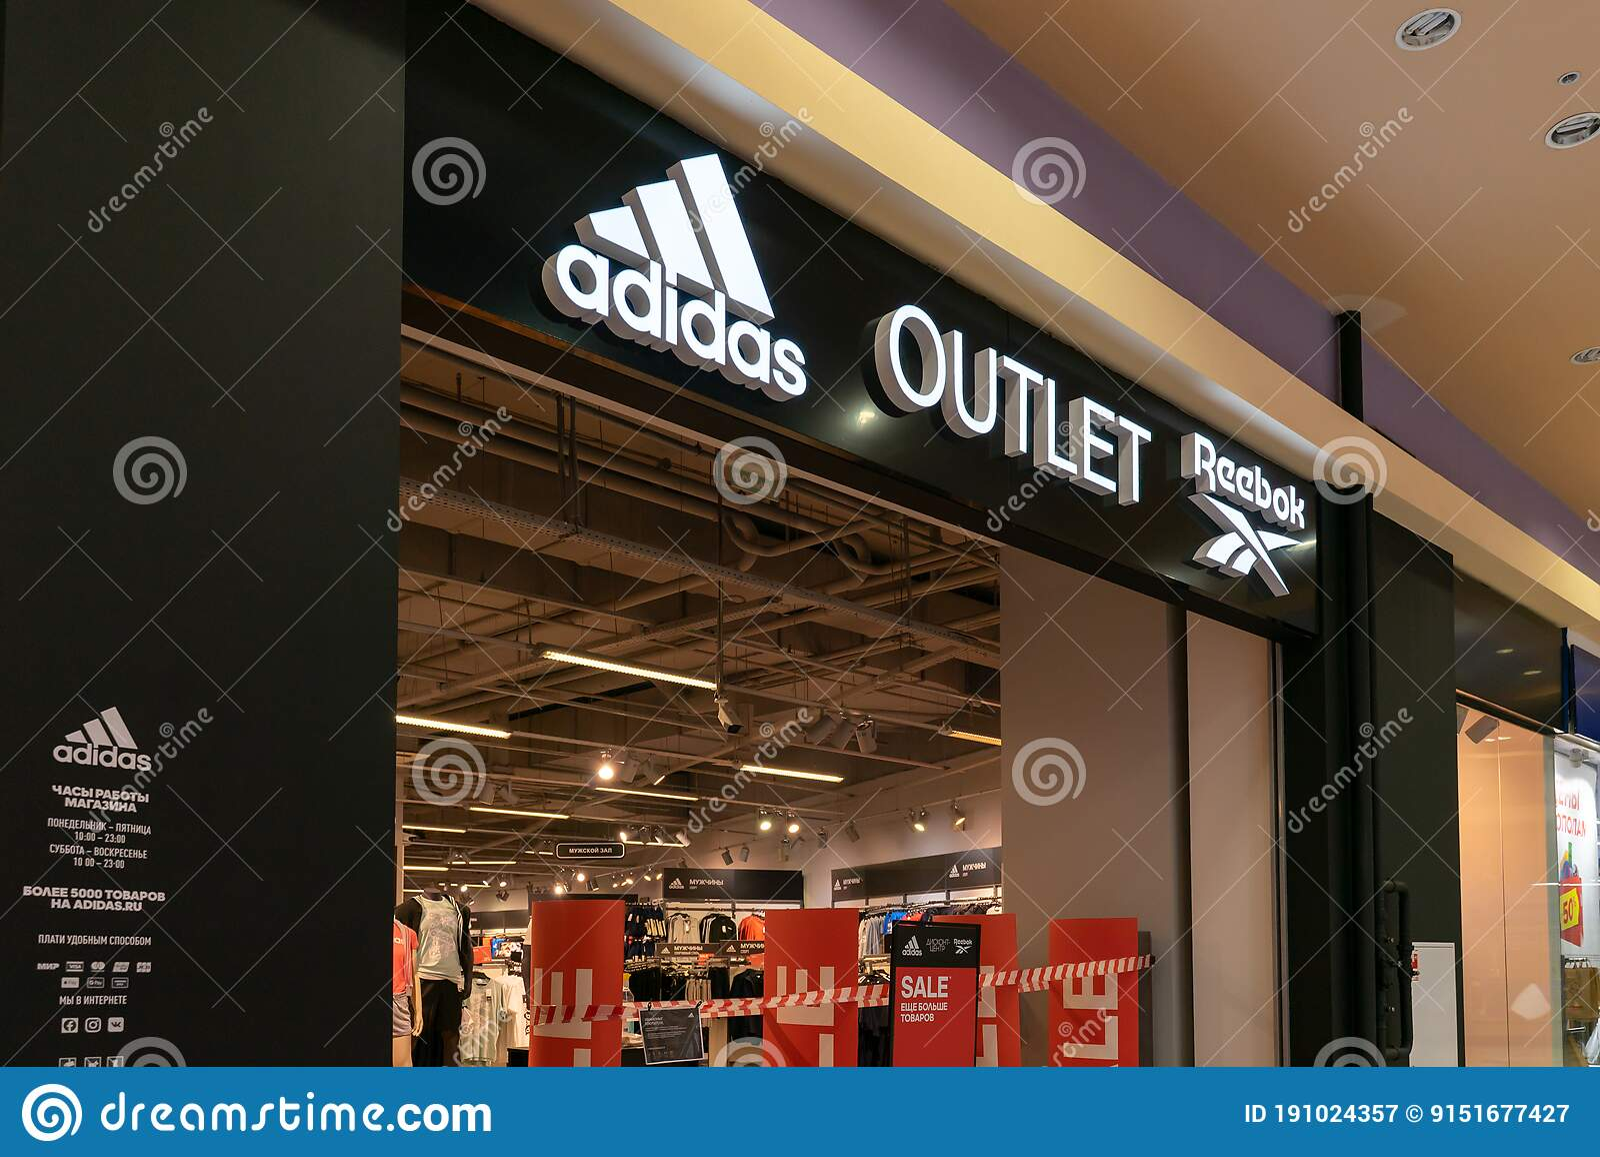 mensaje Copiar desconcertado  424 Adidas Outlet Photos - Free & Royalty-Free Stock Photos from Dreamstime